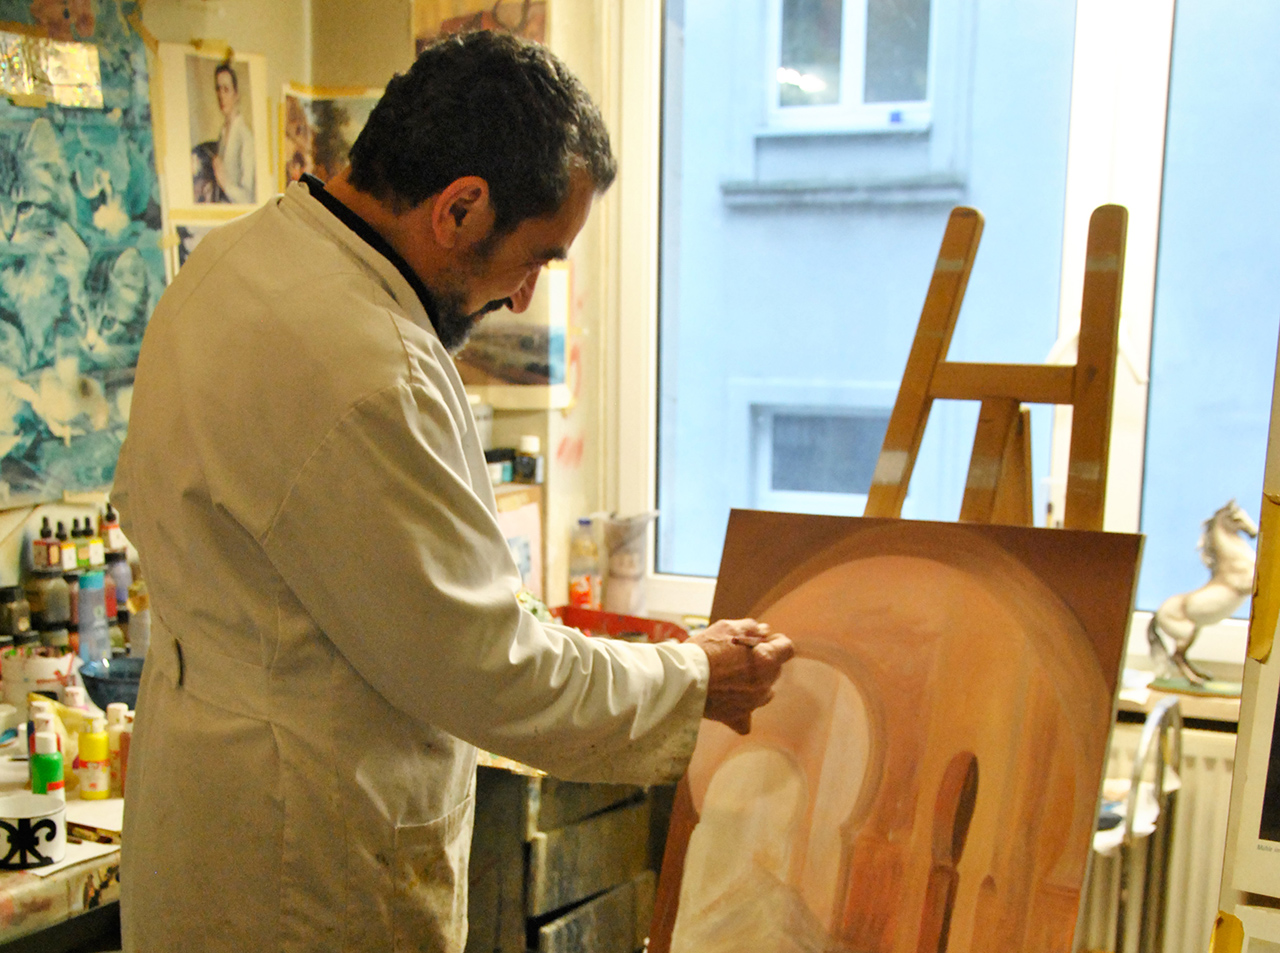 El Idrissi ist ursprünglich Maler